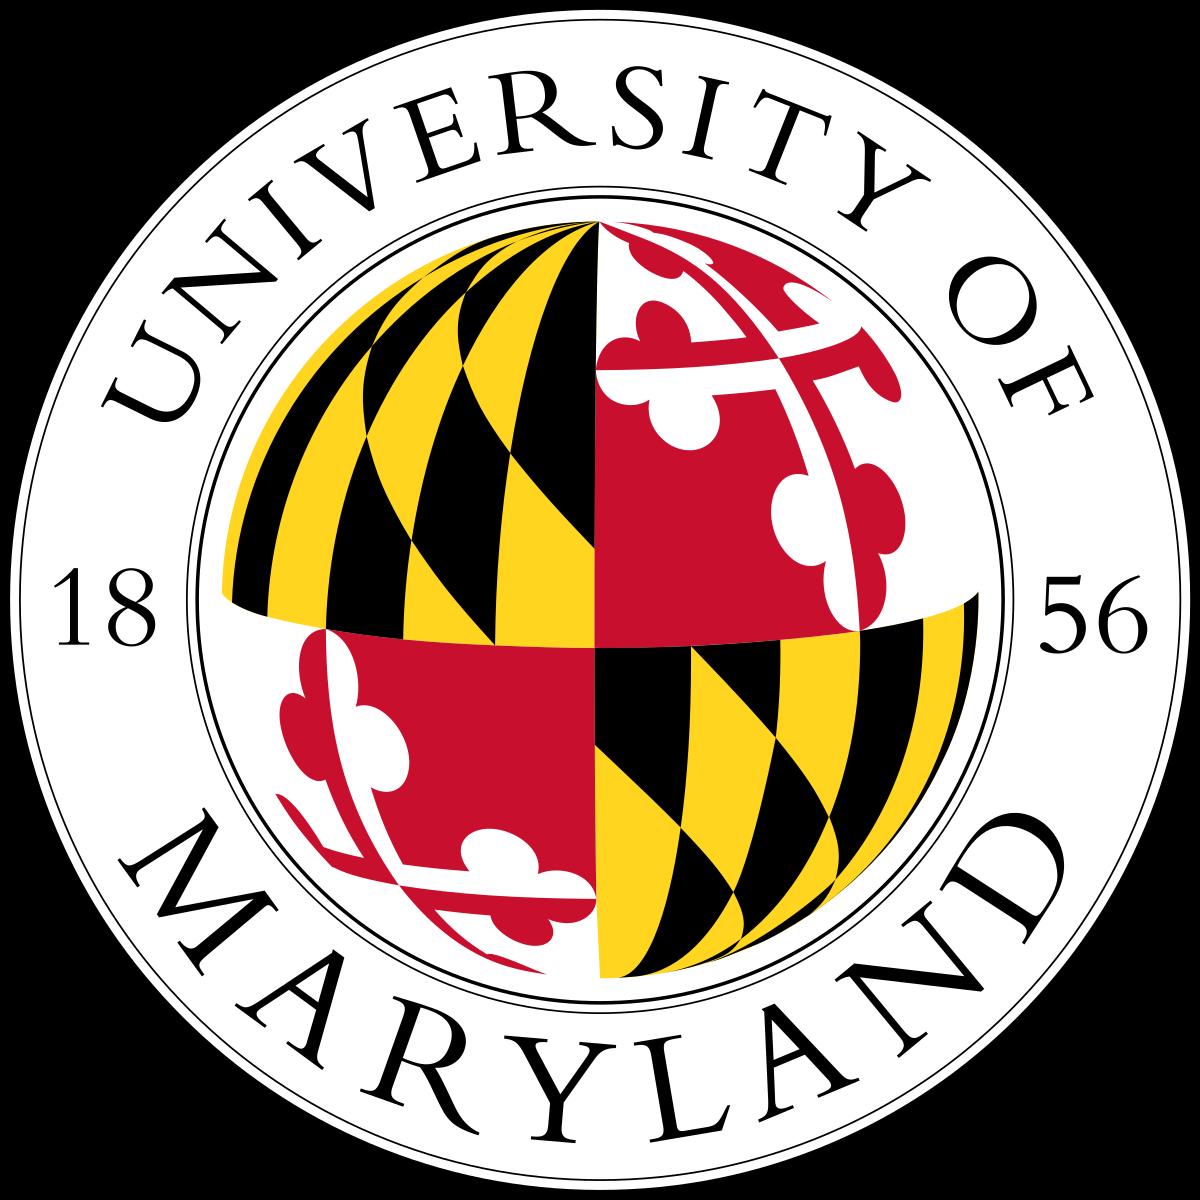 University of Maryland – College Park